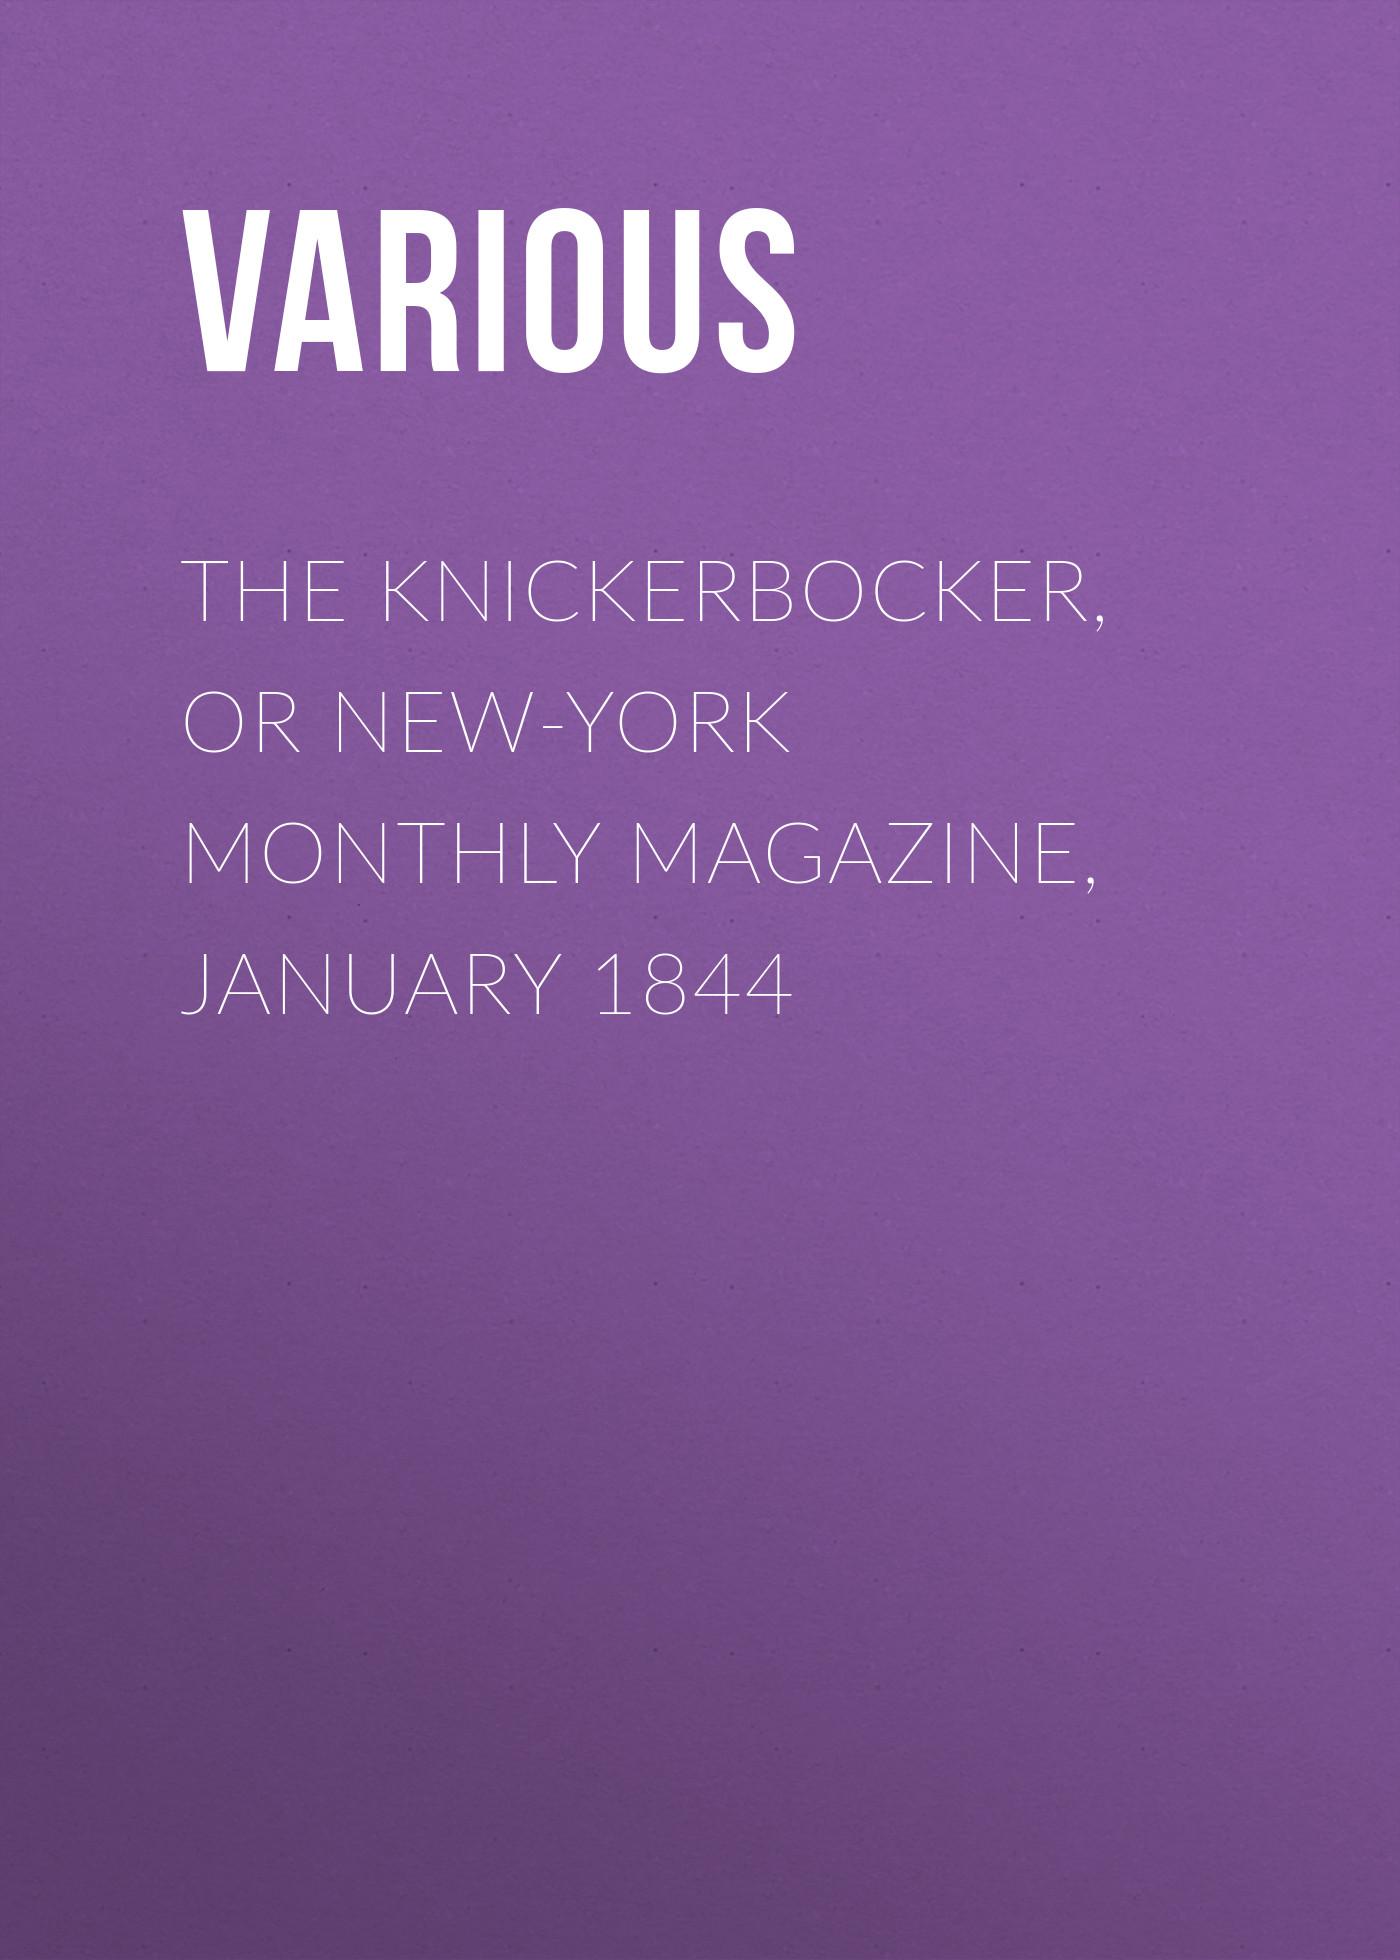 лучшая цена Various The Knickerbocker, or New-York Monthly Magazine, January 1844